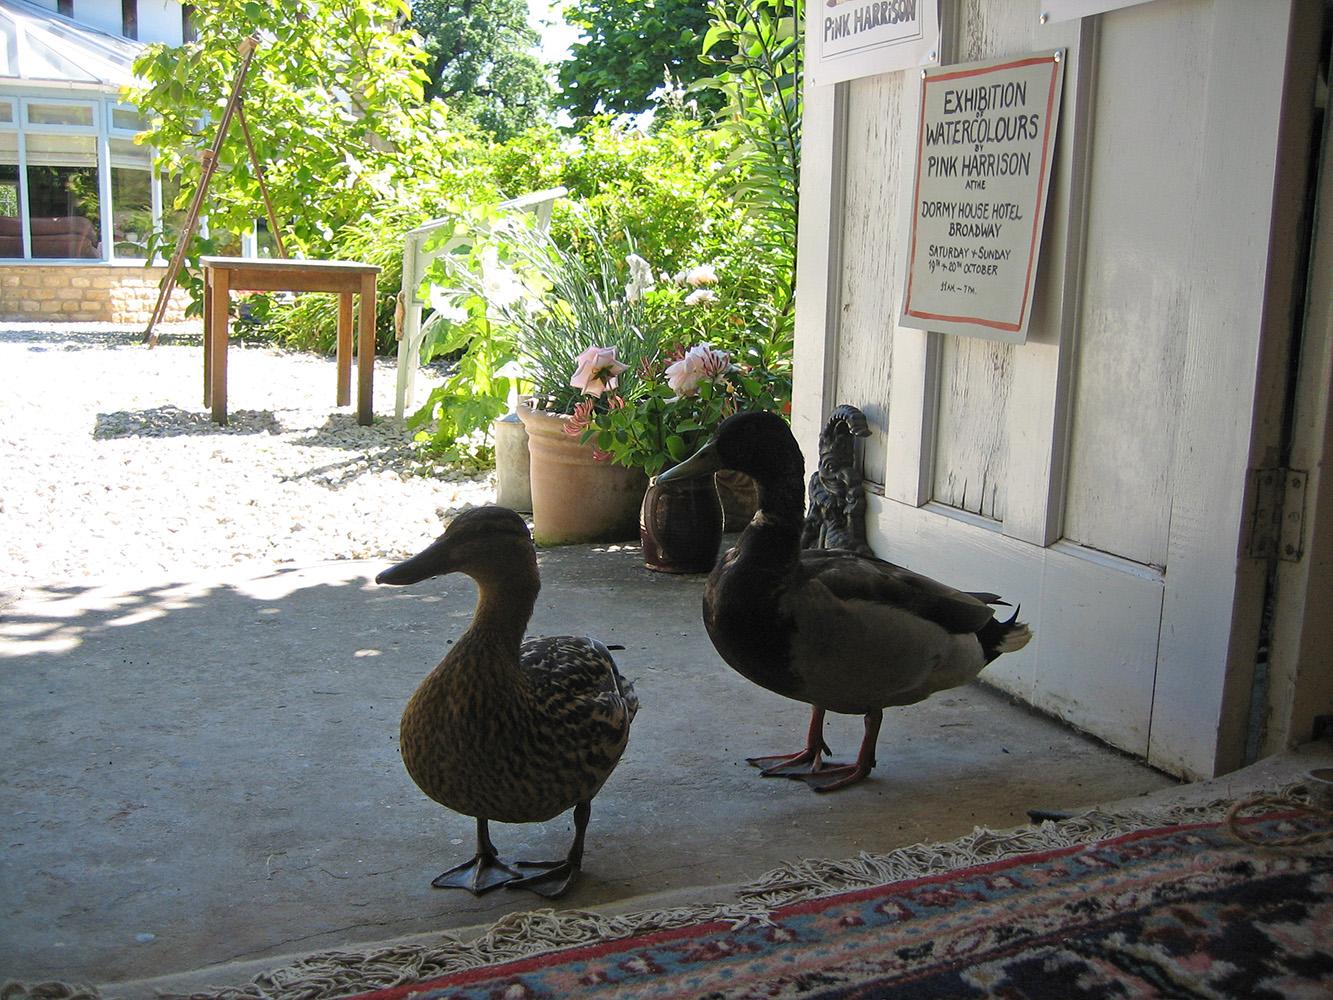 ducks-visiting-Pink-in-her-studio.jpg